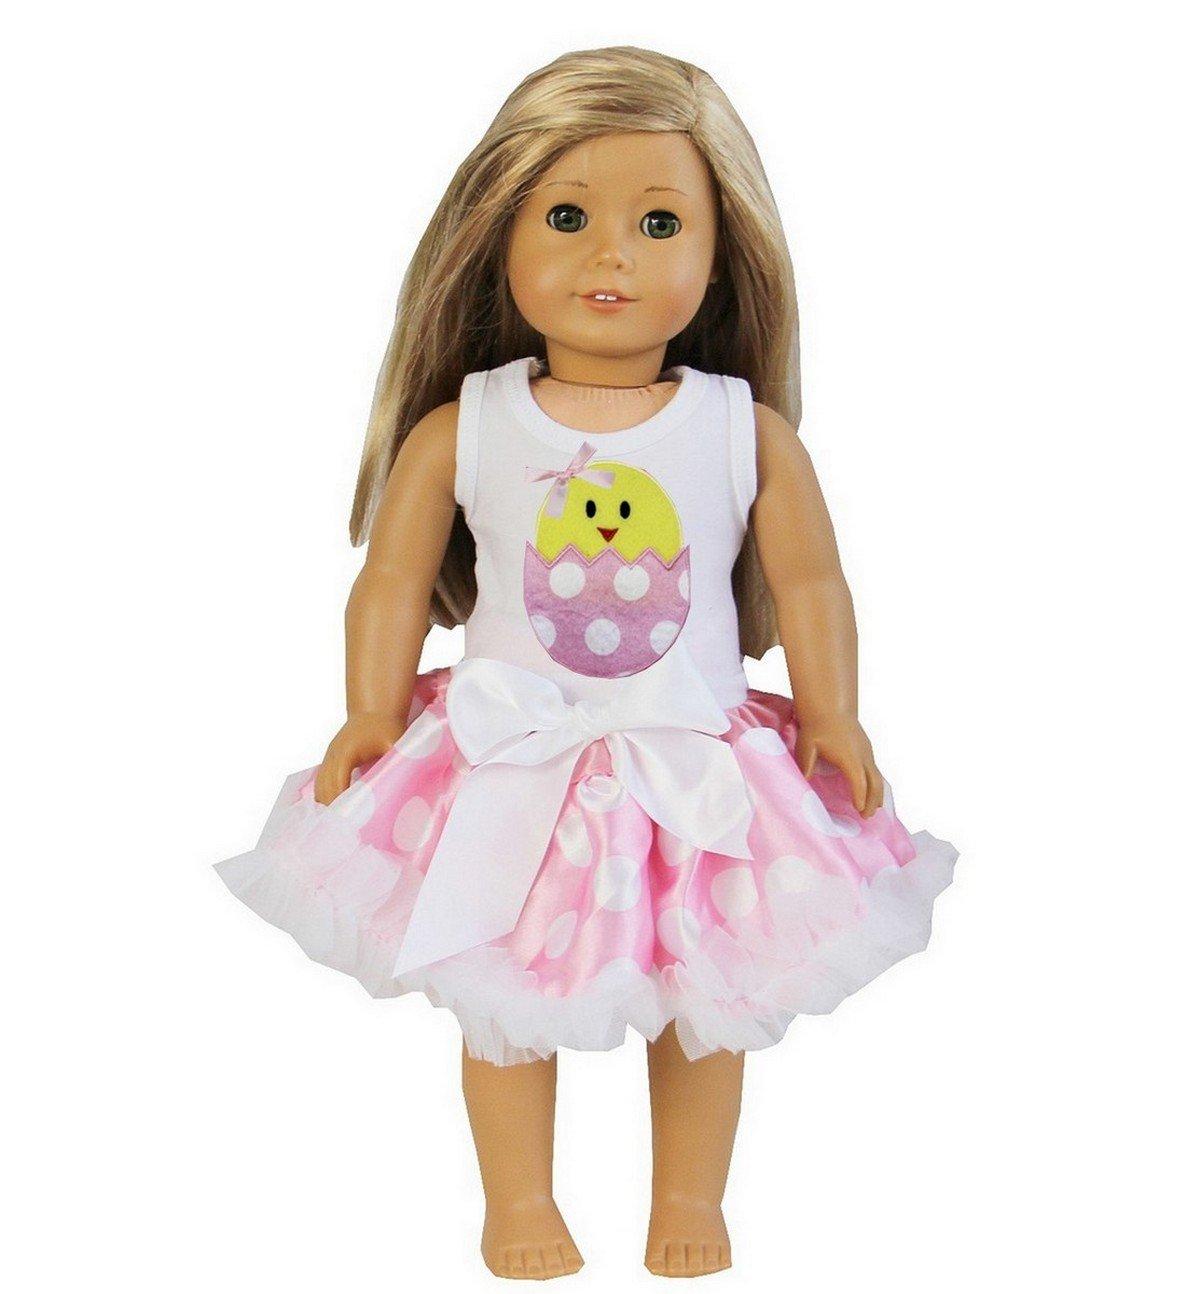 18 American Girl Doll Pink Polka Dots Pettiskirt Easter Egg Chick Tee Ameda